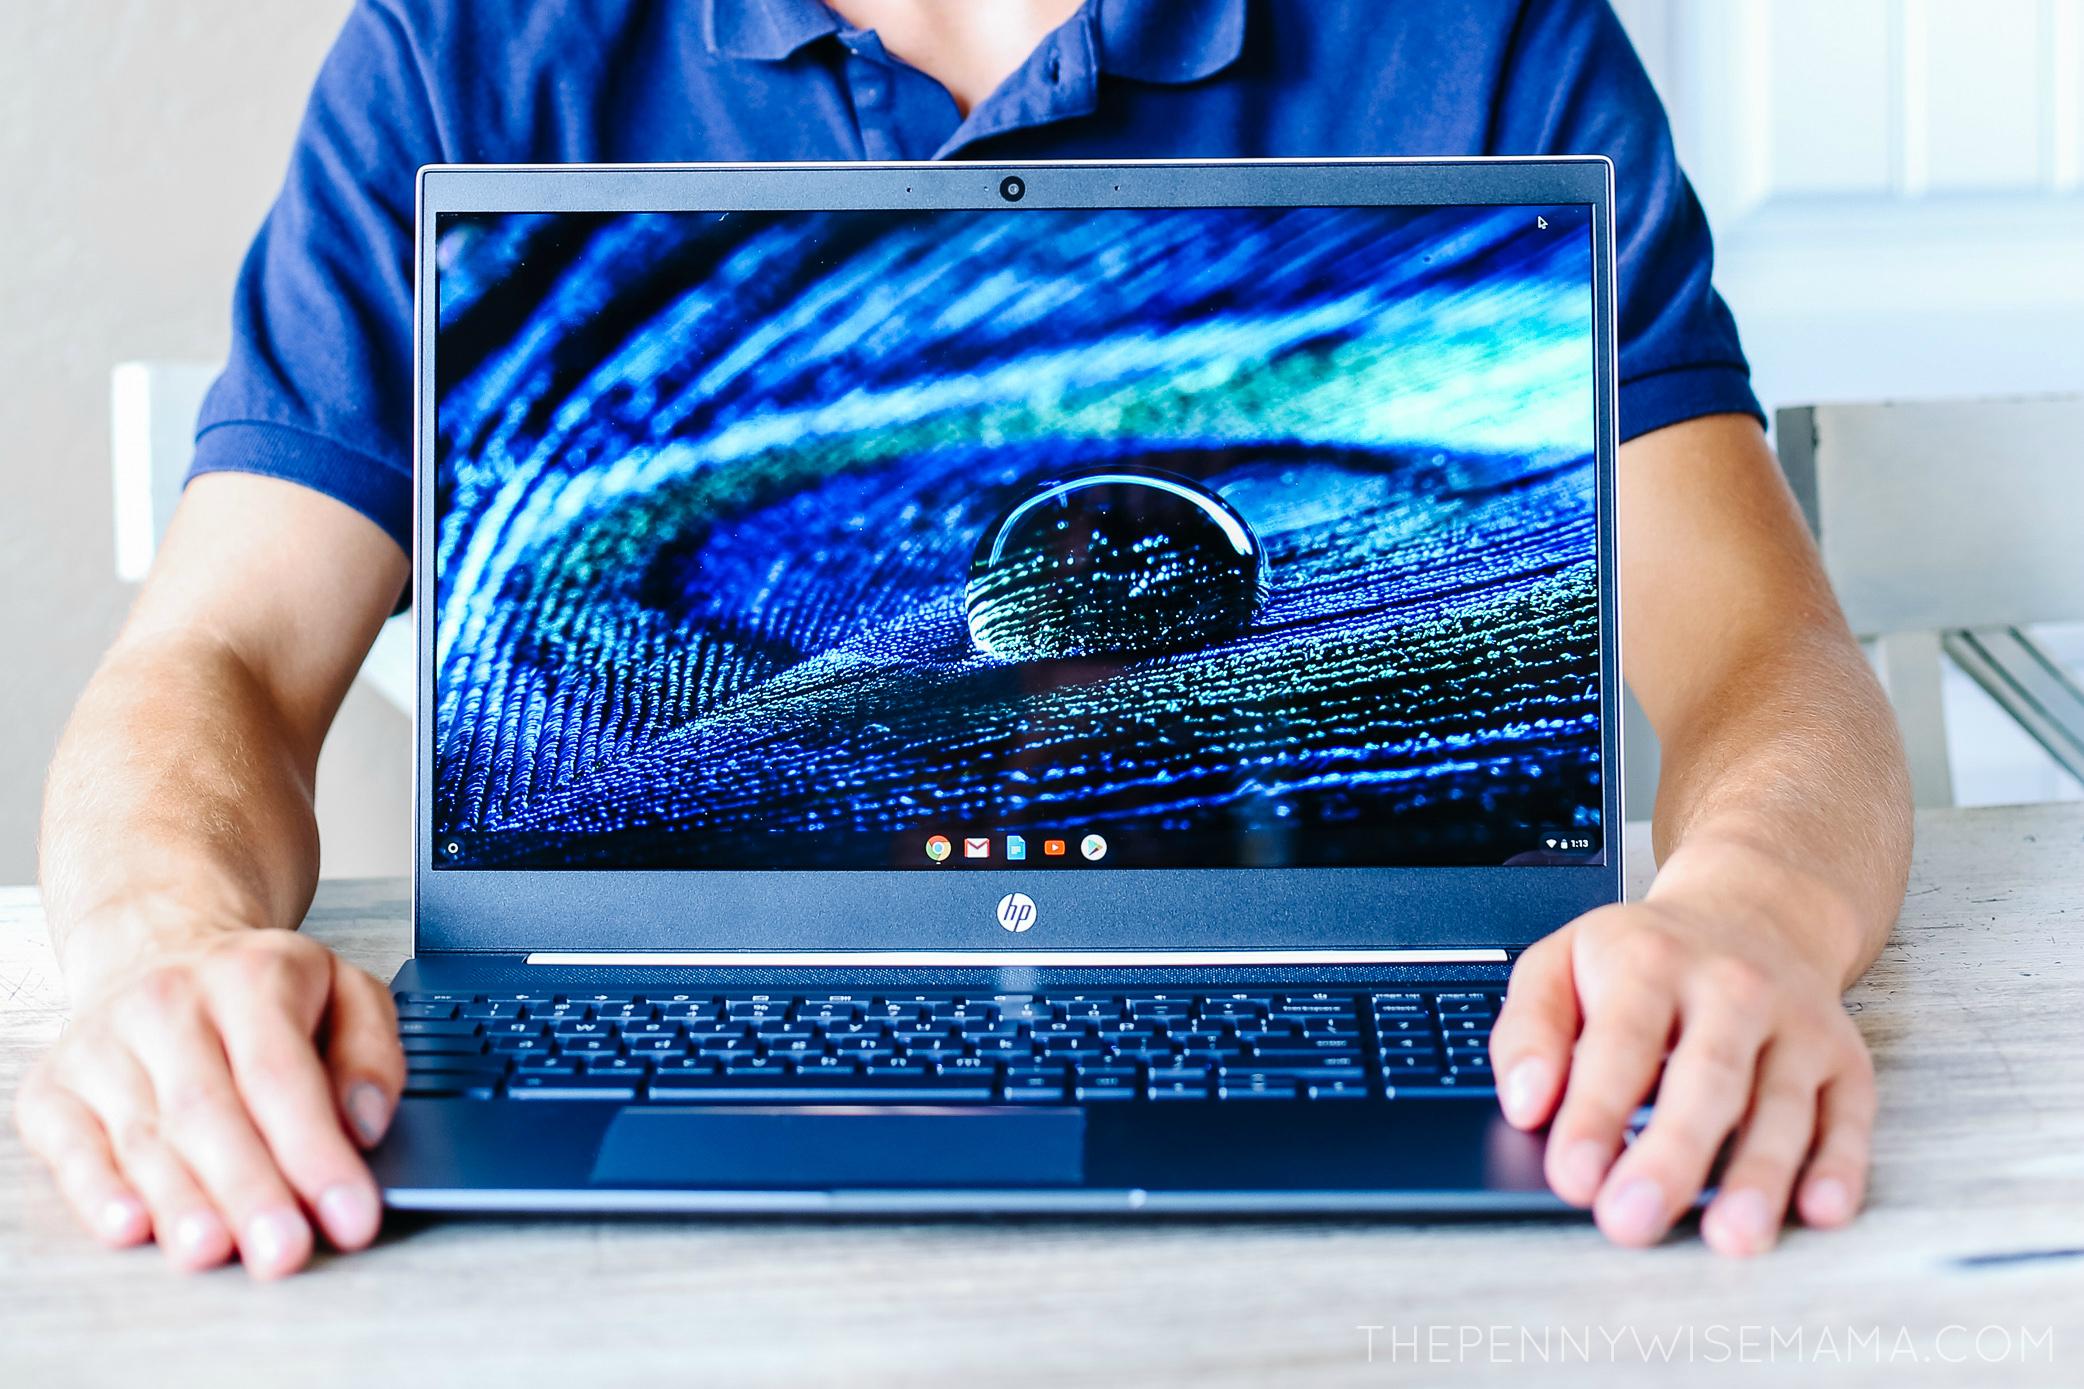 Beautiful HD touchscreen display on HP Chromebook 15